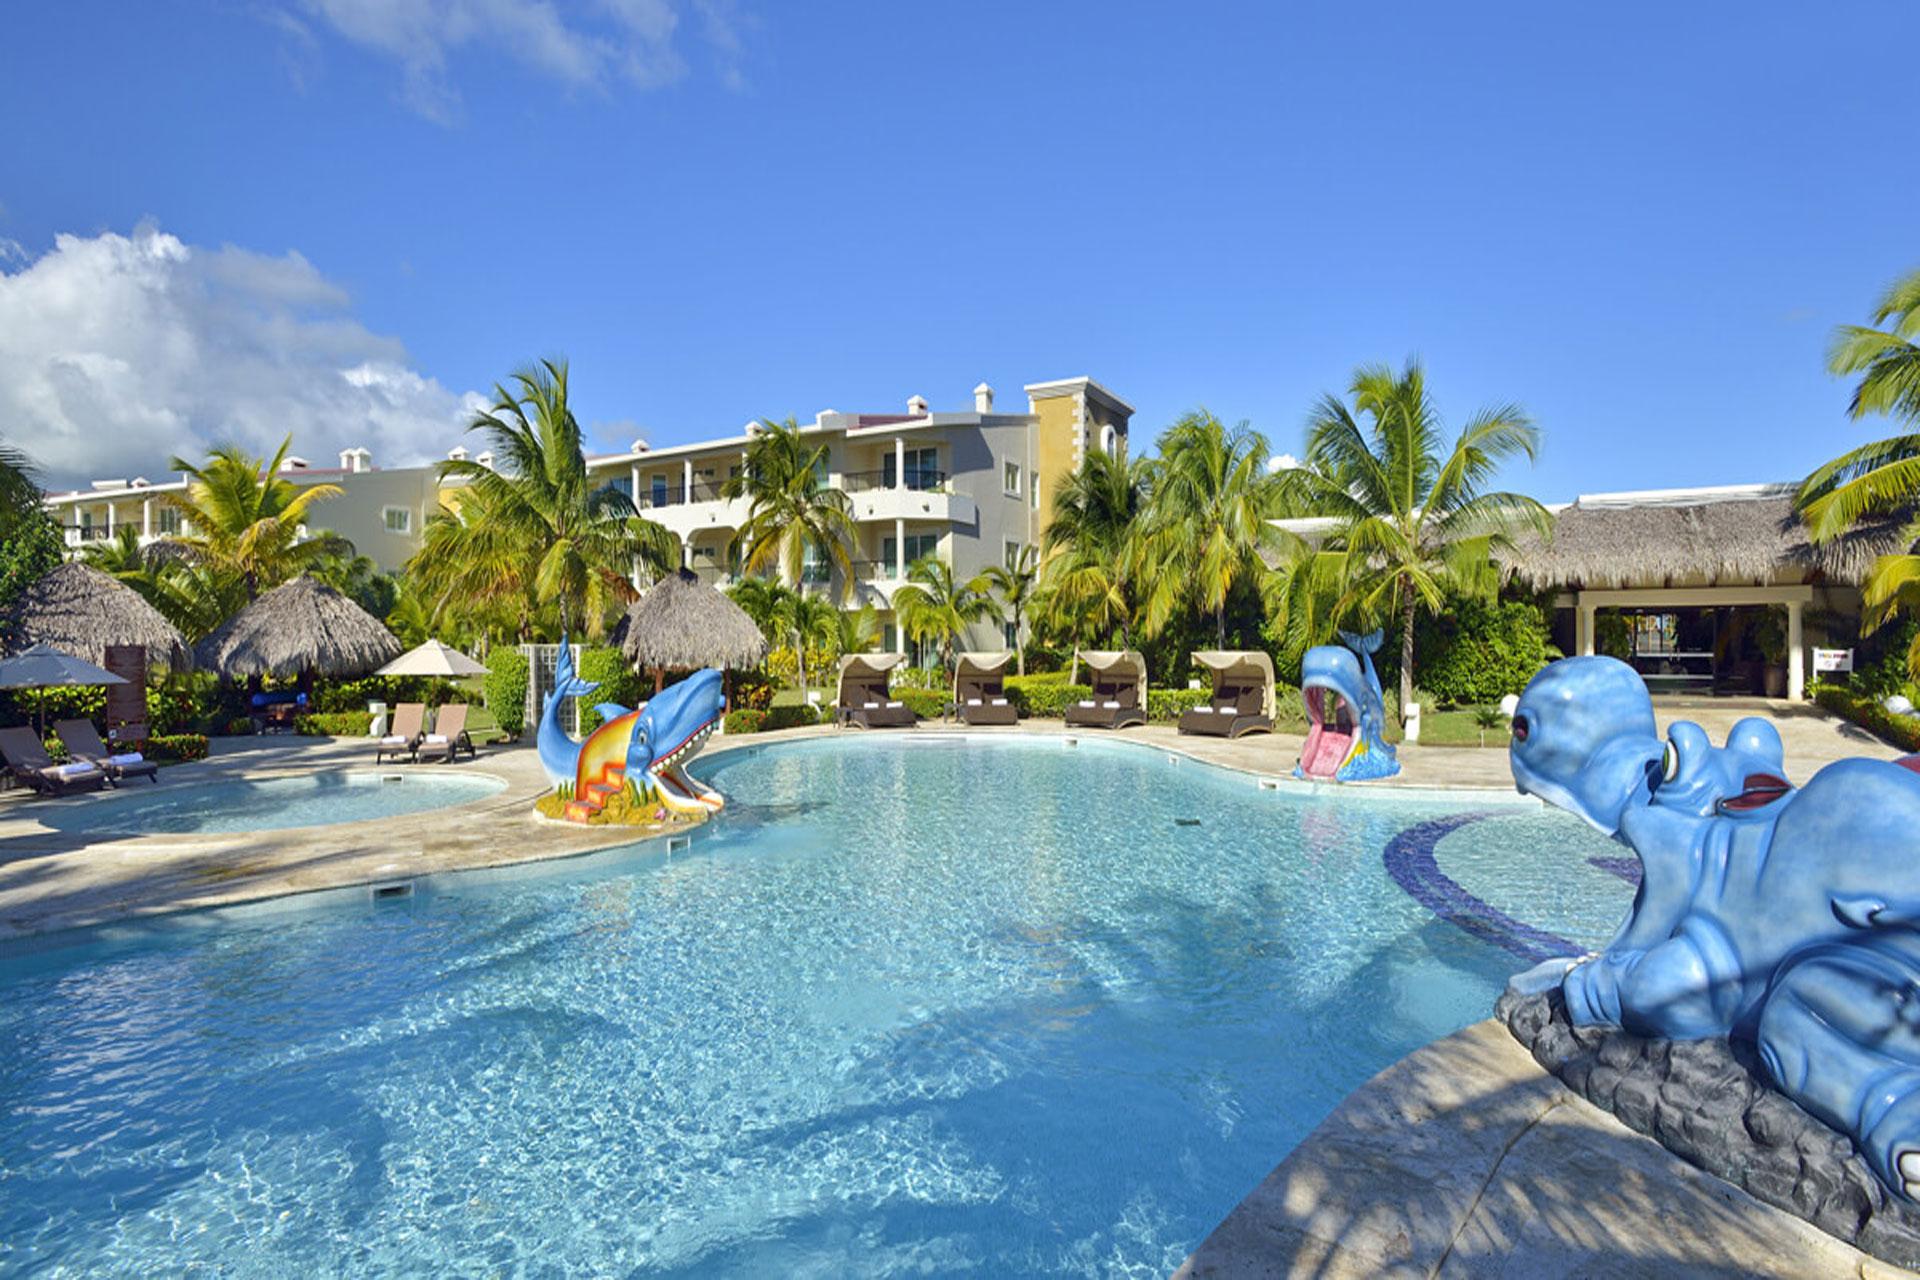 Pool and children's slides at Paradisus Punta Cana Resort